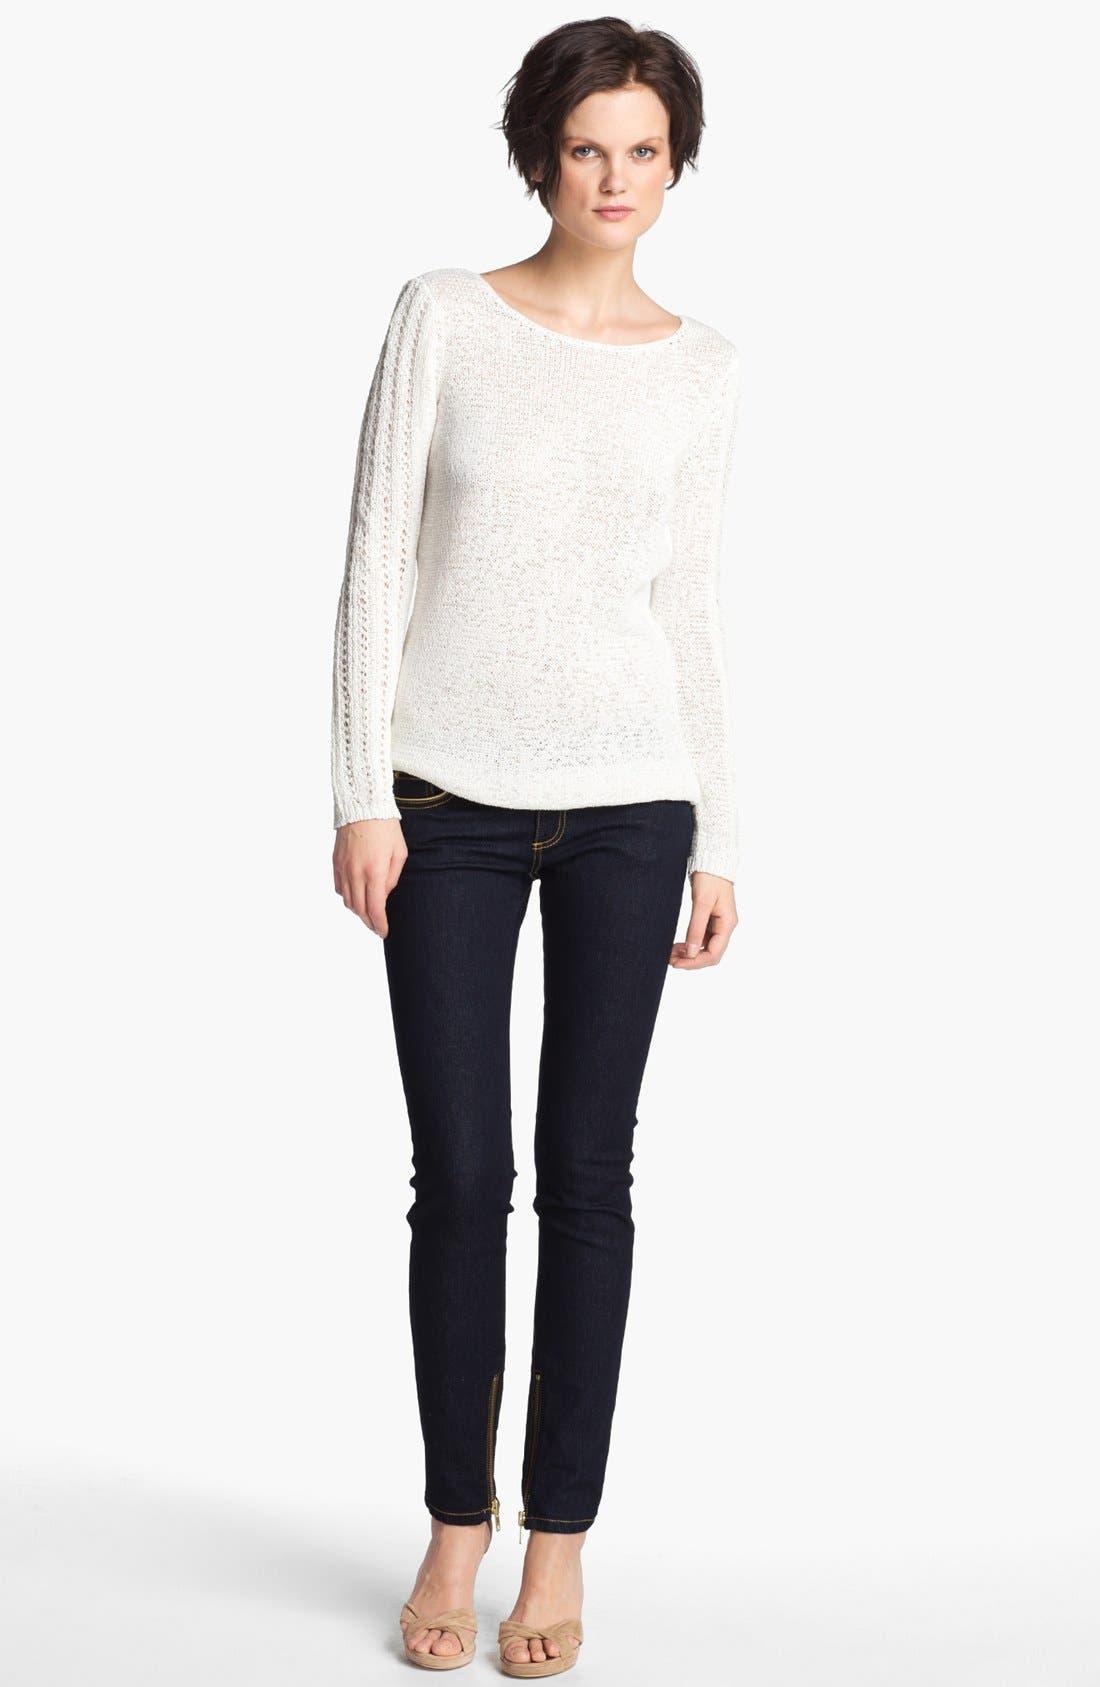 Alternate Image 1 Selected - Rachel Zoe 'Karla' Open Stitch Tunic Sweater